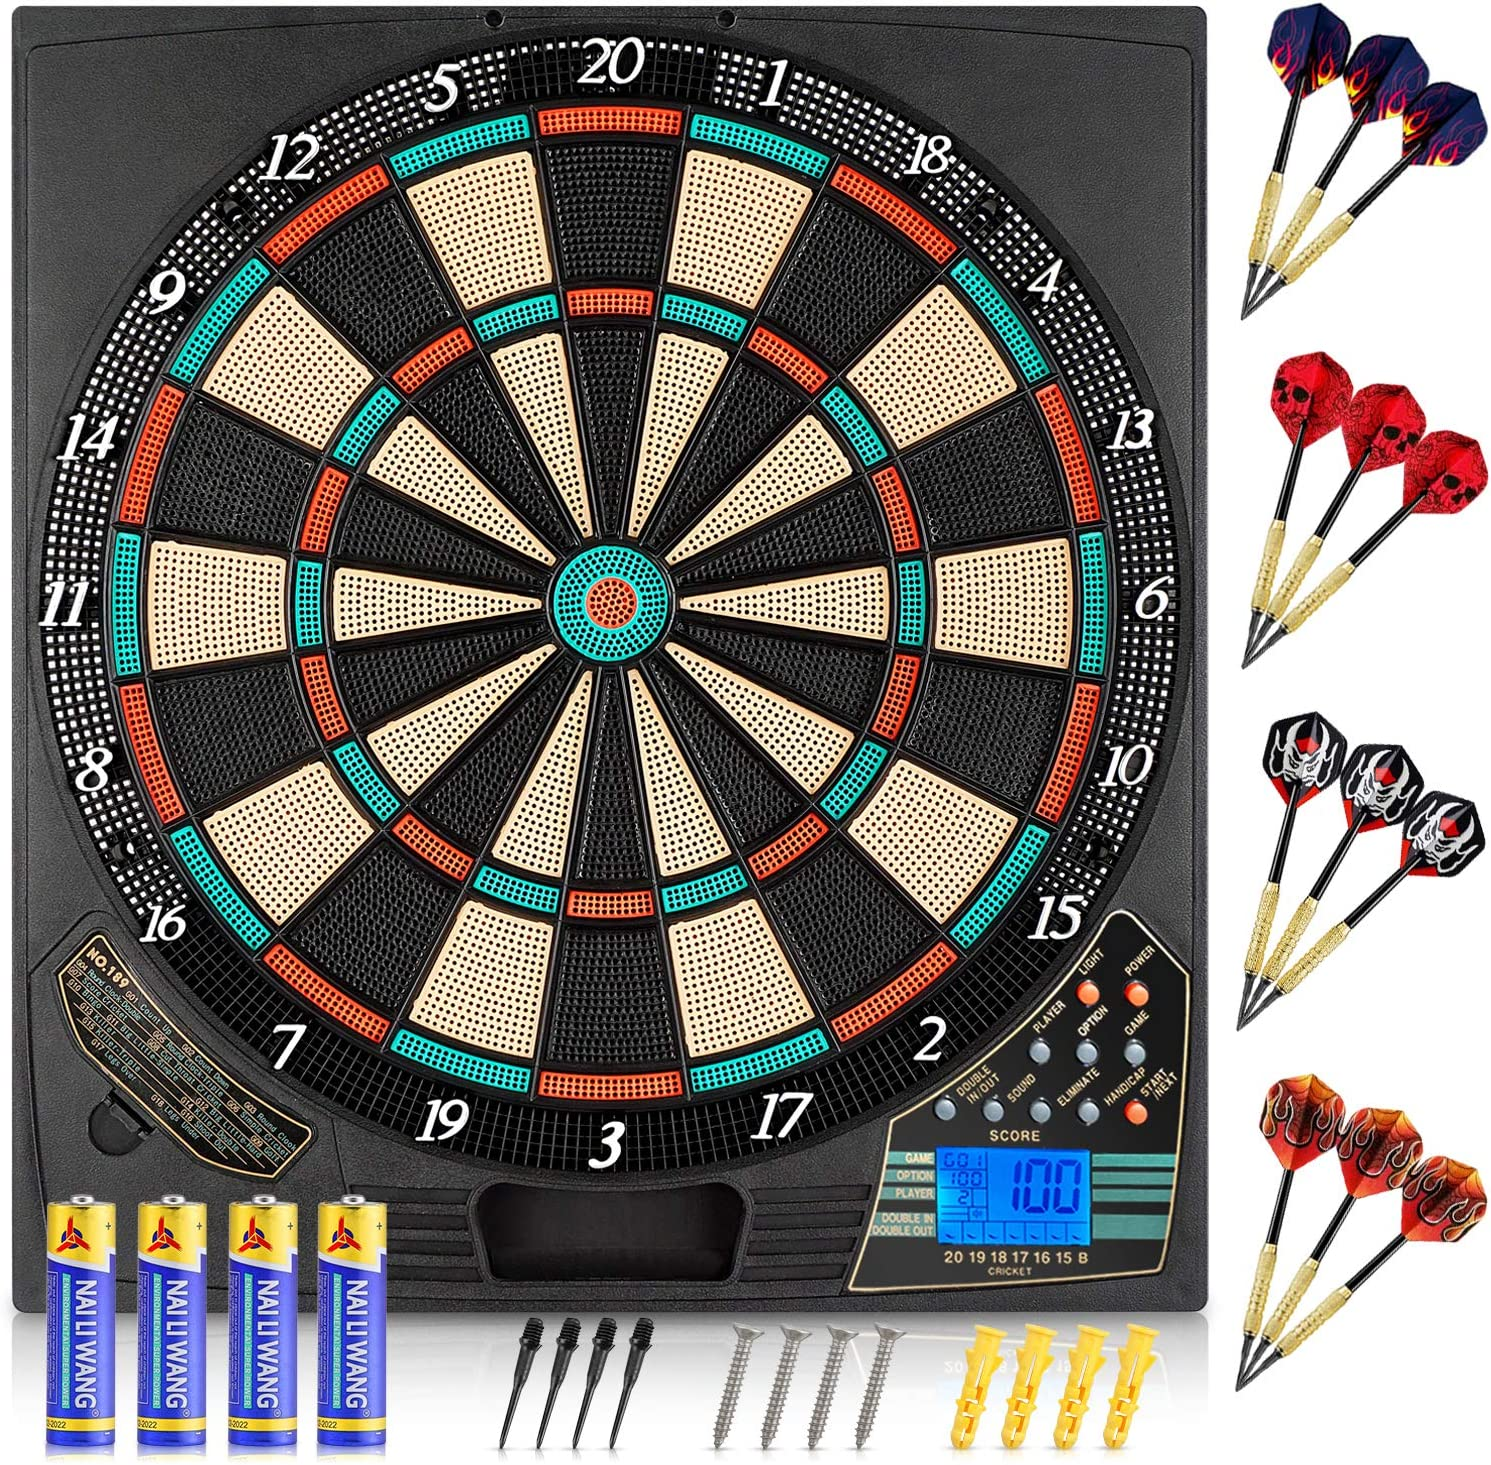 Xdodnev 100pcs Nylon Electronic Darts Tip 25mm 2BA Soft Tip Dartboard Game Accessories